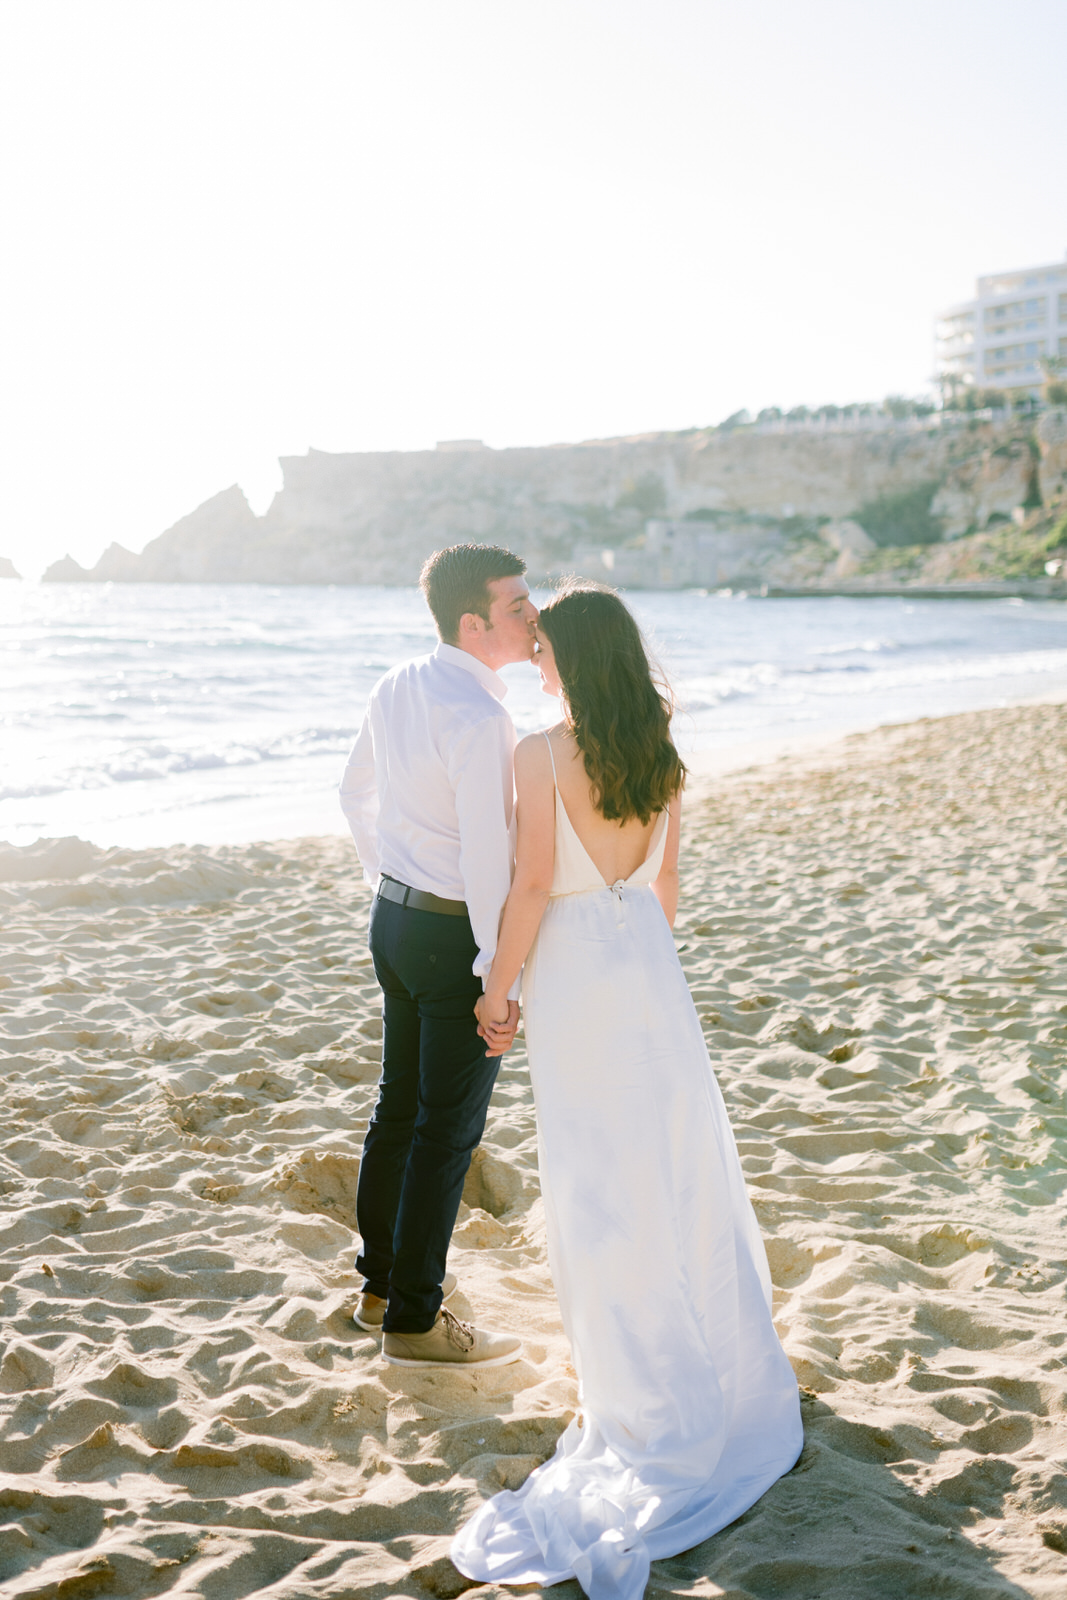 mdina wedding, malta wedding photography, malta elopement, golden bay malta wedding photos, wedding photographer malta, malta wedding venue, villa bologna wedding (86).jpg